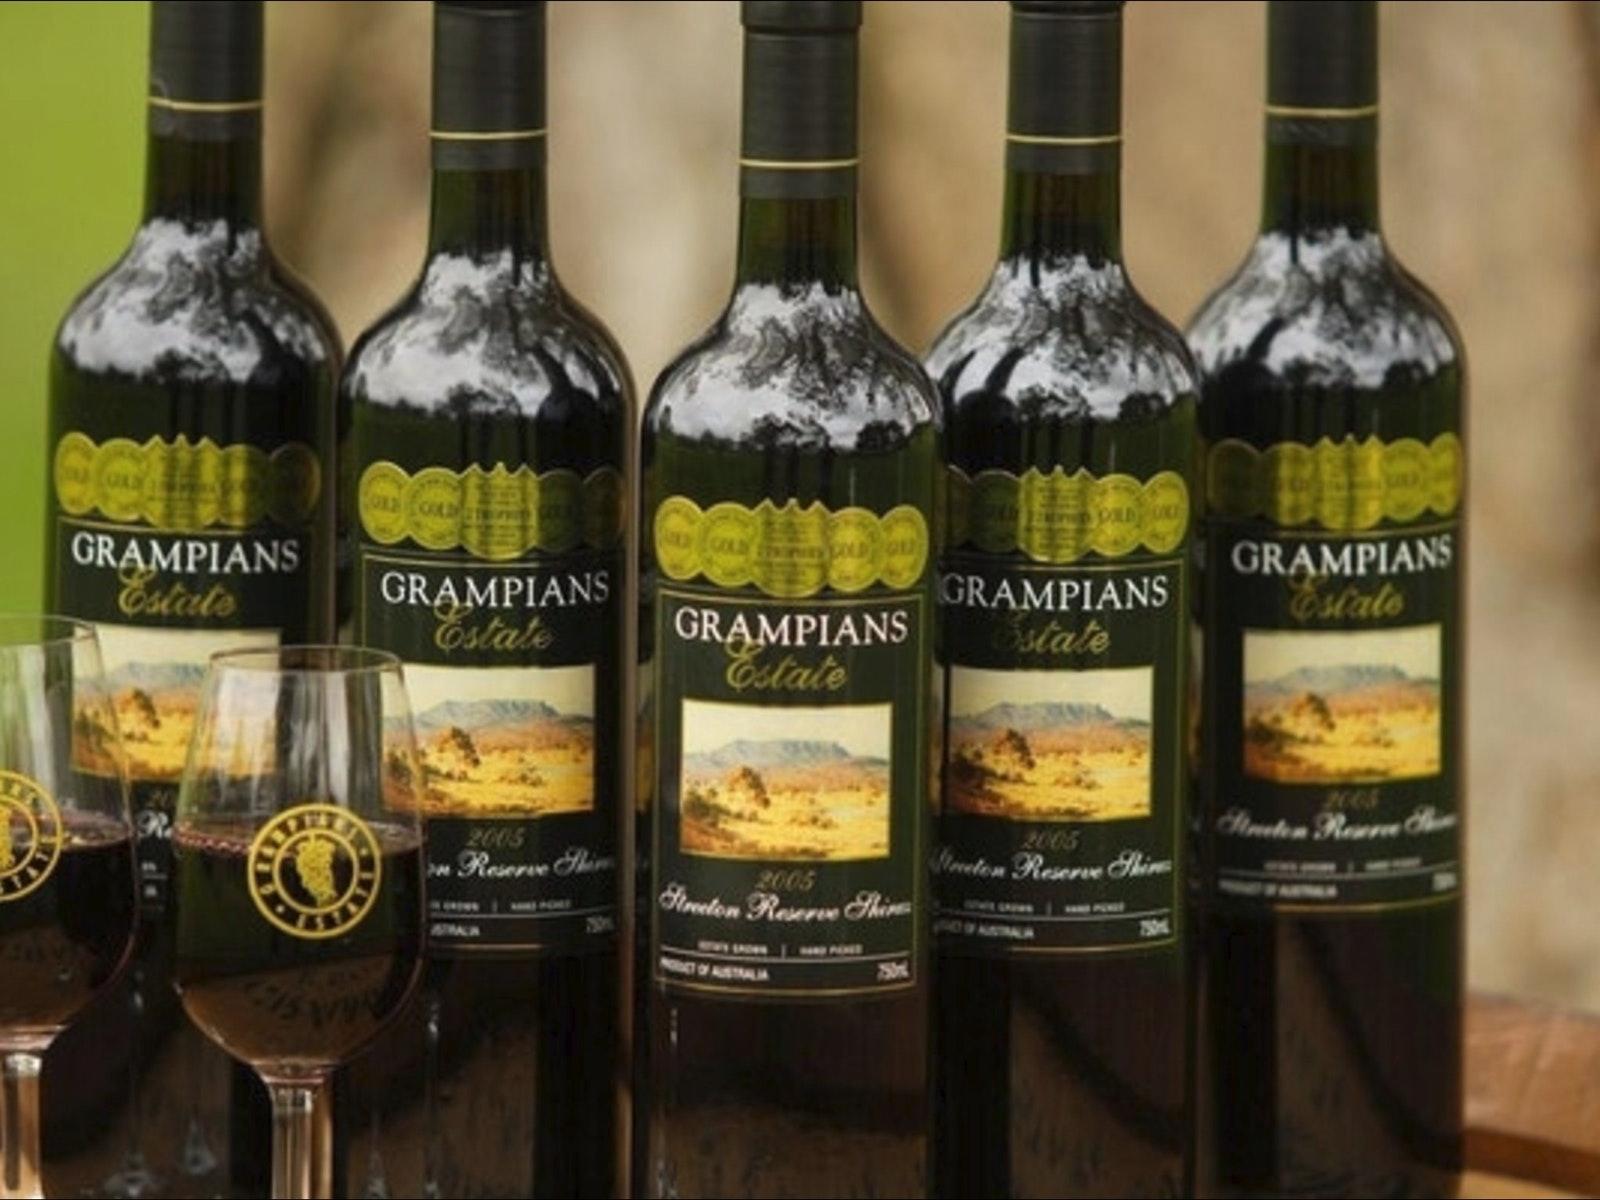 Grampians Estate Reserve Shiraz